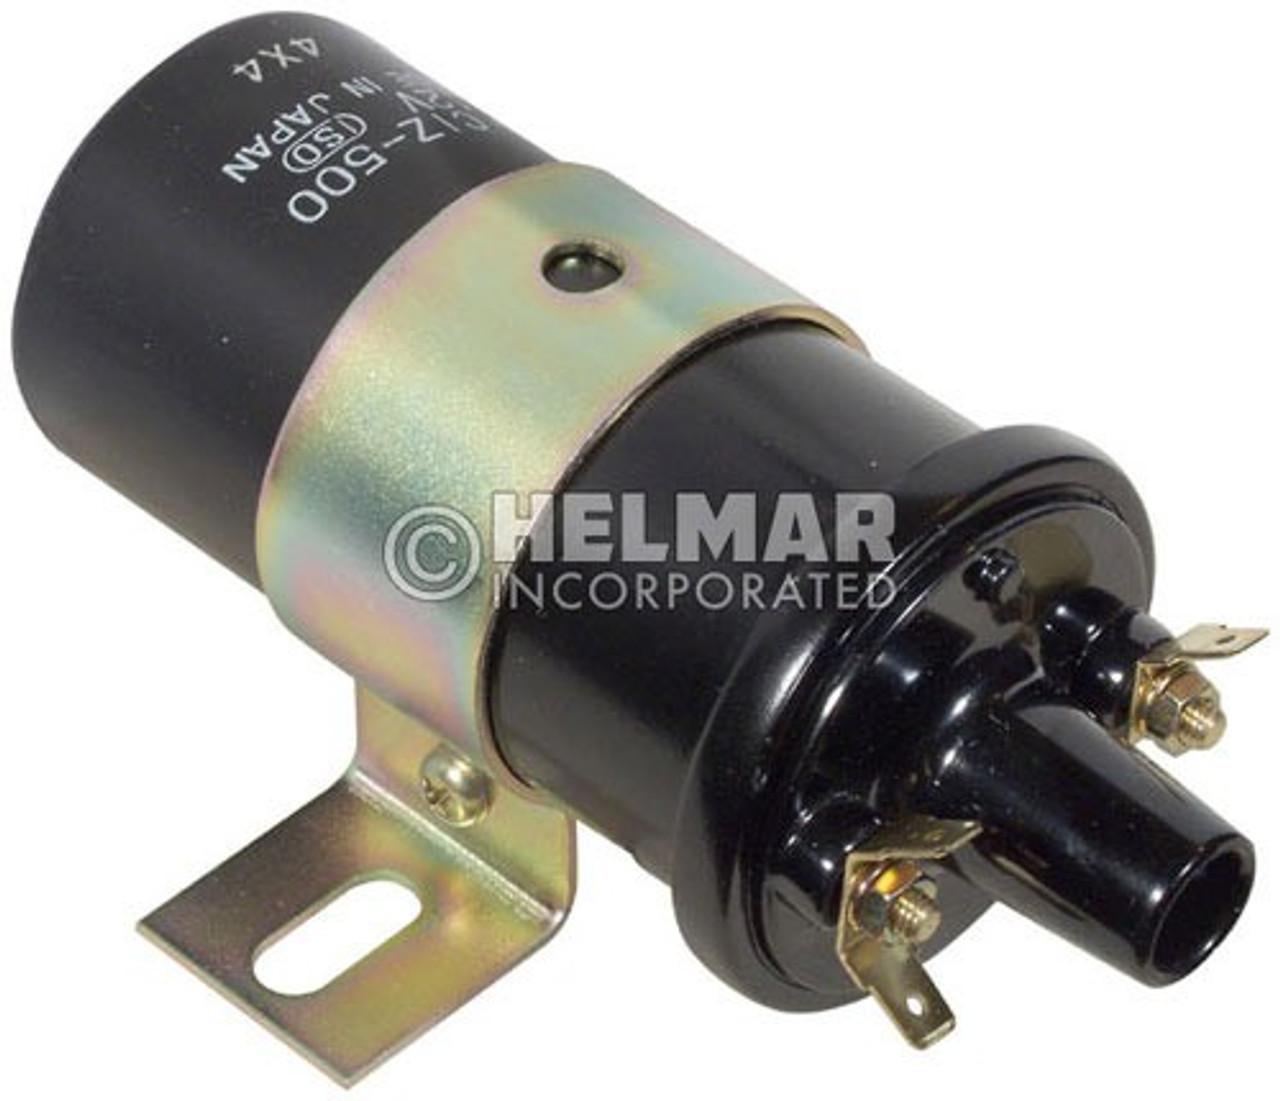 5195844-00 Yale Original Hitachi Ignition Coil, 12 Volt Internal Resistor, Type A